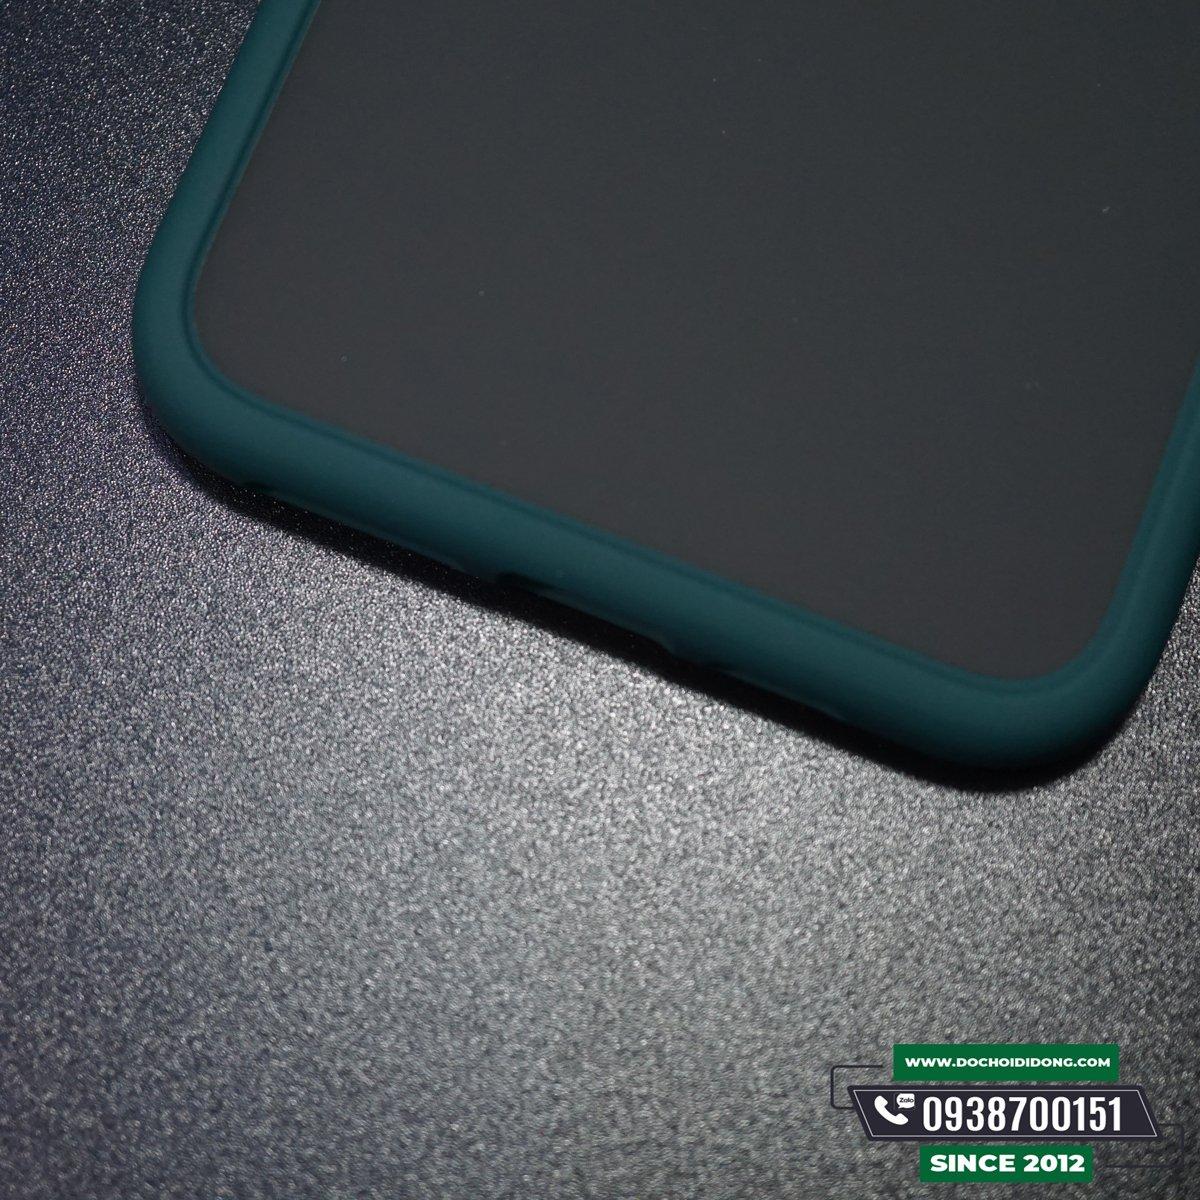 op-lung-iphone-11-pro-max-likgus-vien-mau-lung-nham-trong-chong-soc